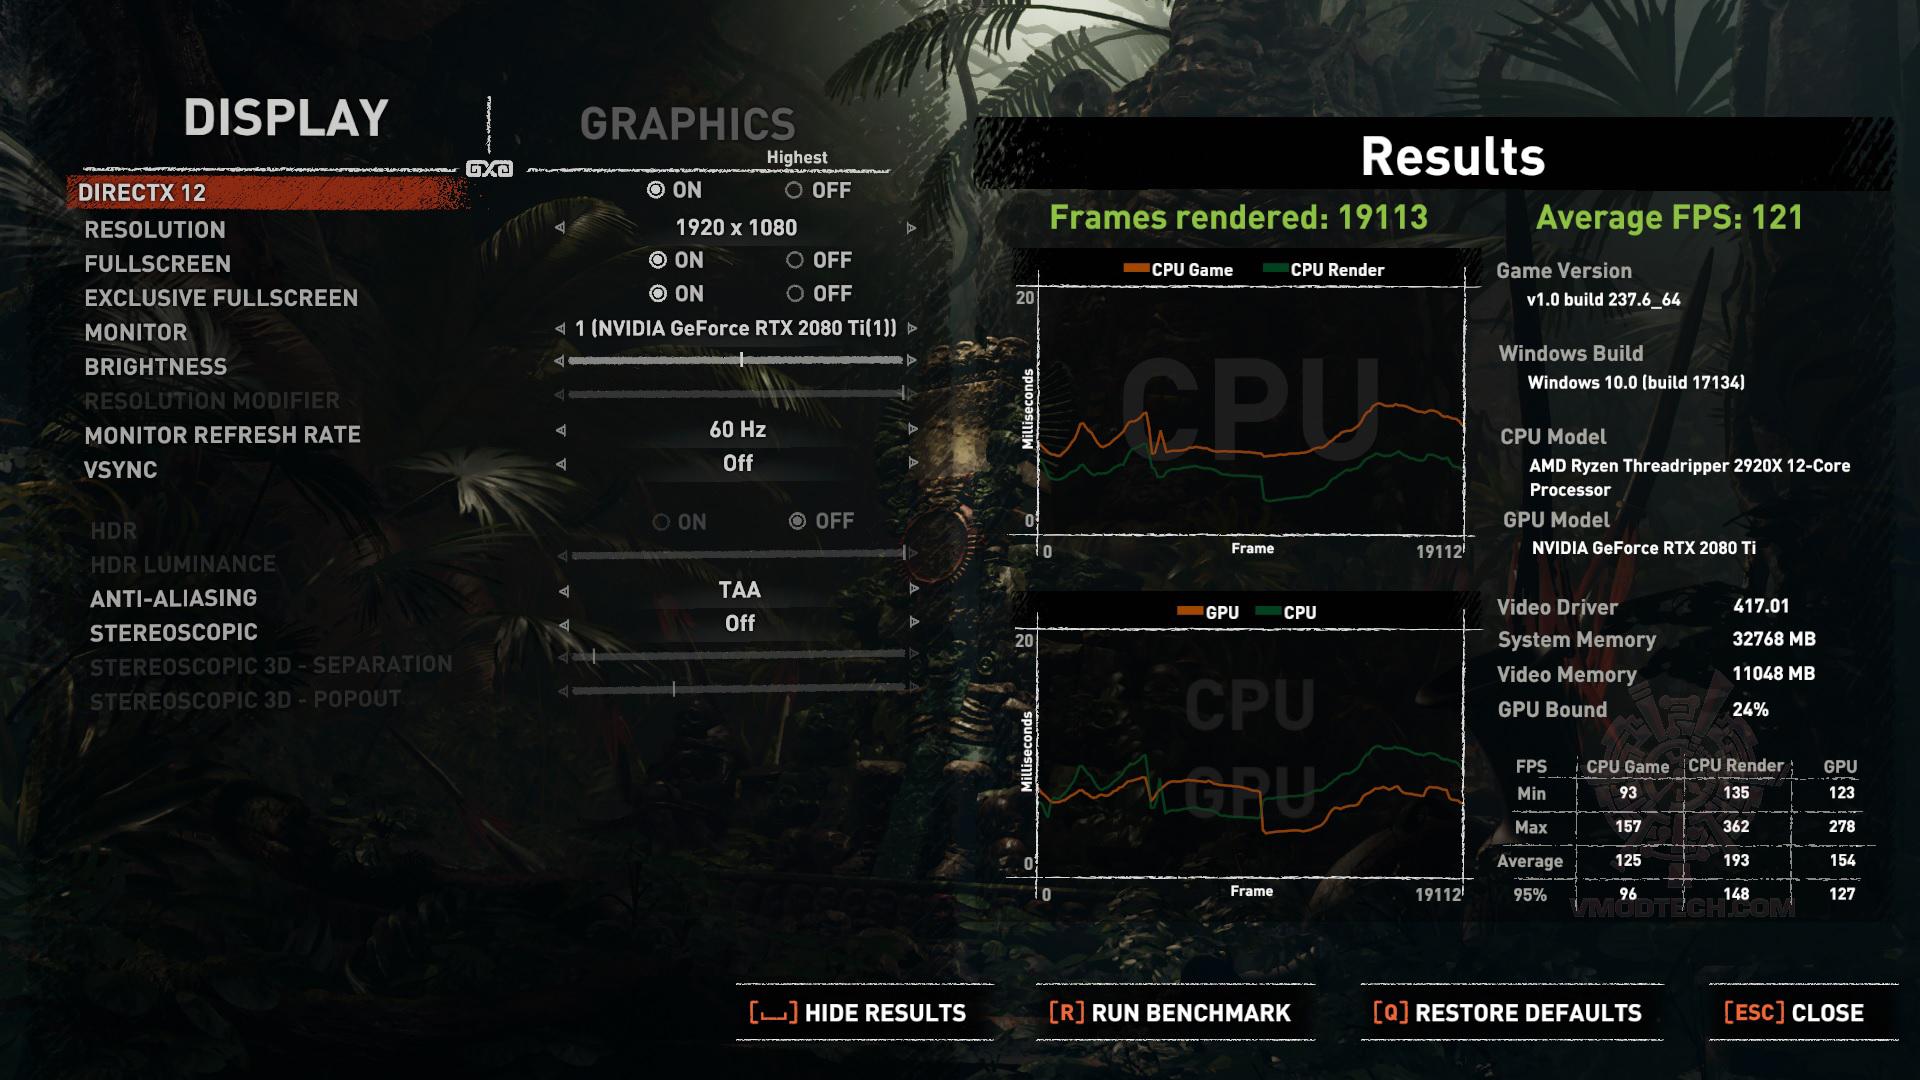 sd tomb AMD RYZEN THREADRIPPER 2920X PROCESSOR REVIEW